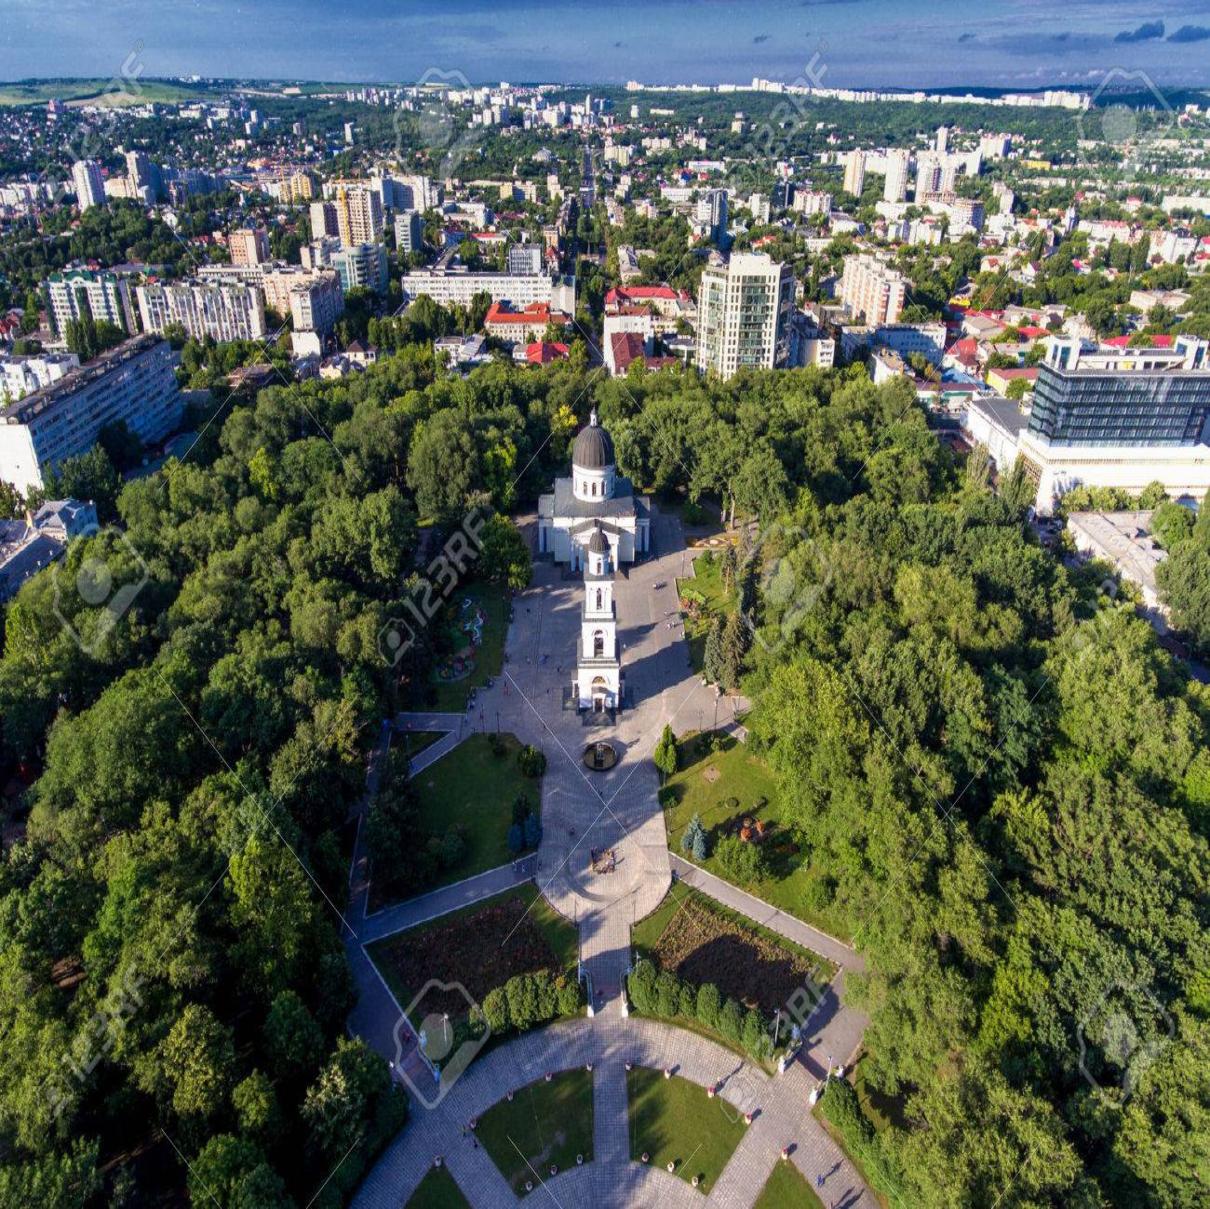 chisinau-republic-of-moldova-aerial-view